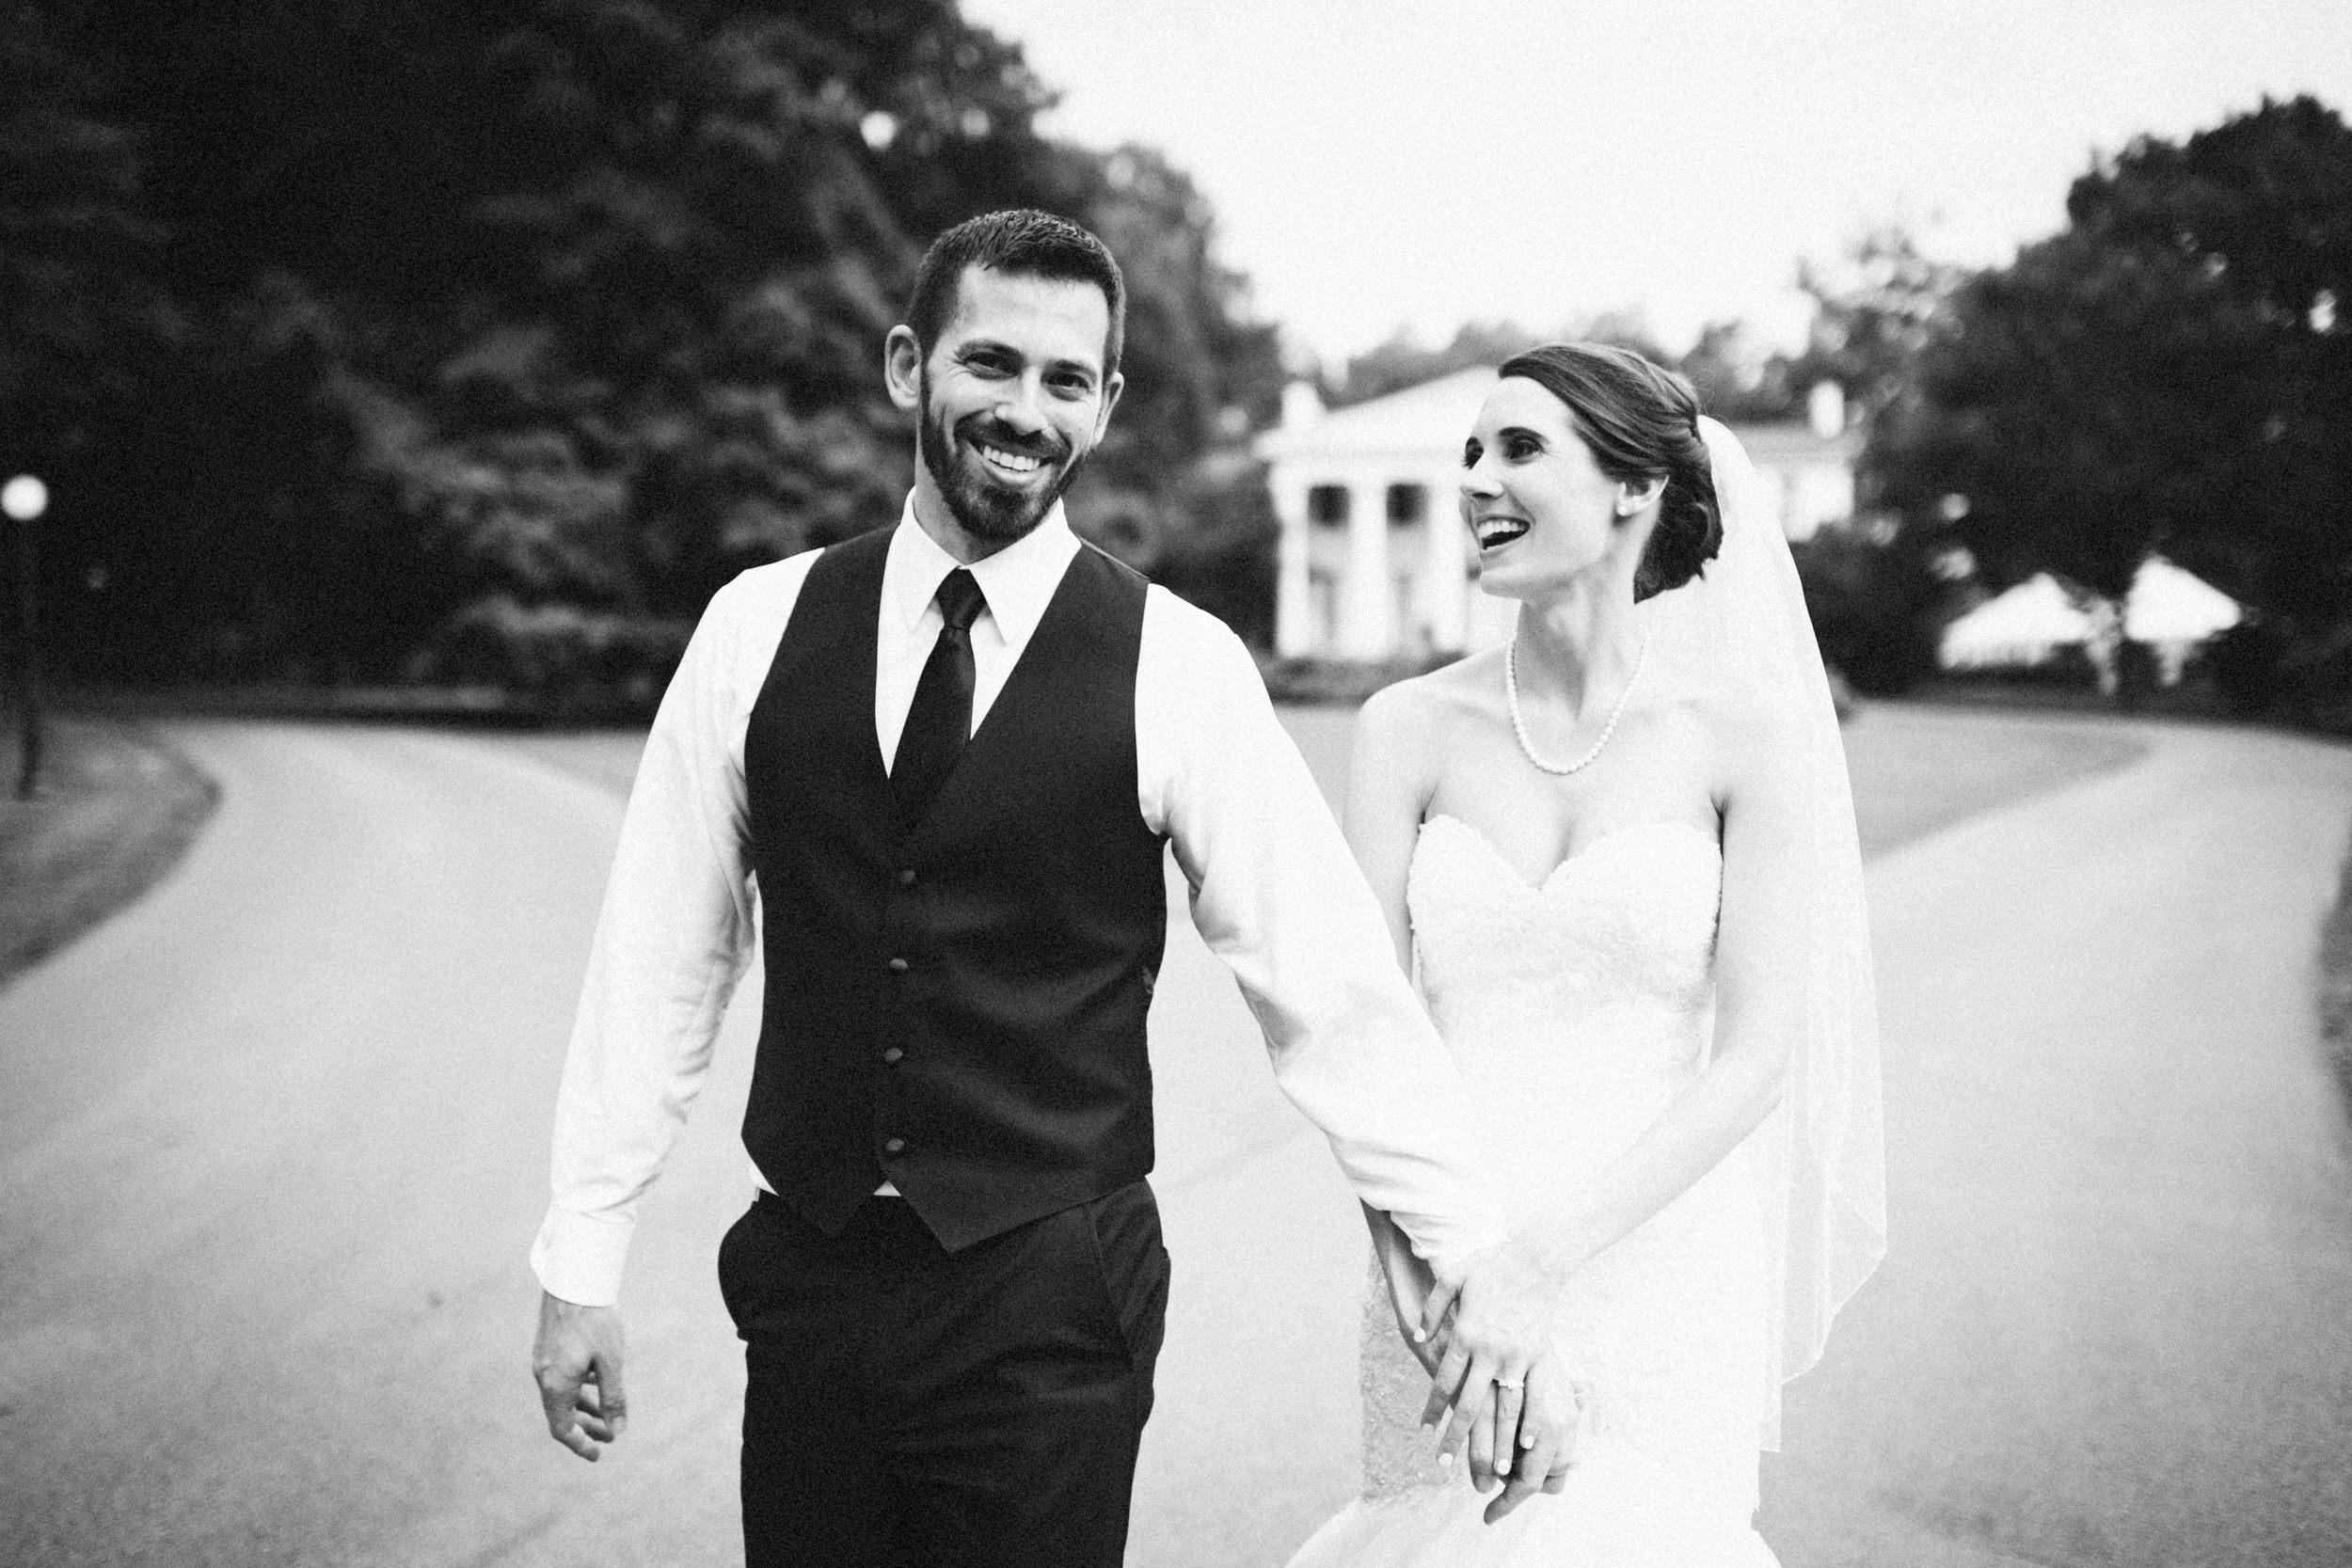 Louisville-Kentucky-Wedding-Elopement-Photographer-Sarah-Katherine-Davis-Photography-Whitehall-Classic-Timeless-Garden-Wedding-566.jpg